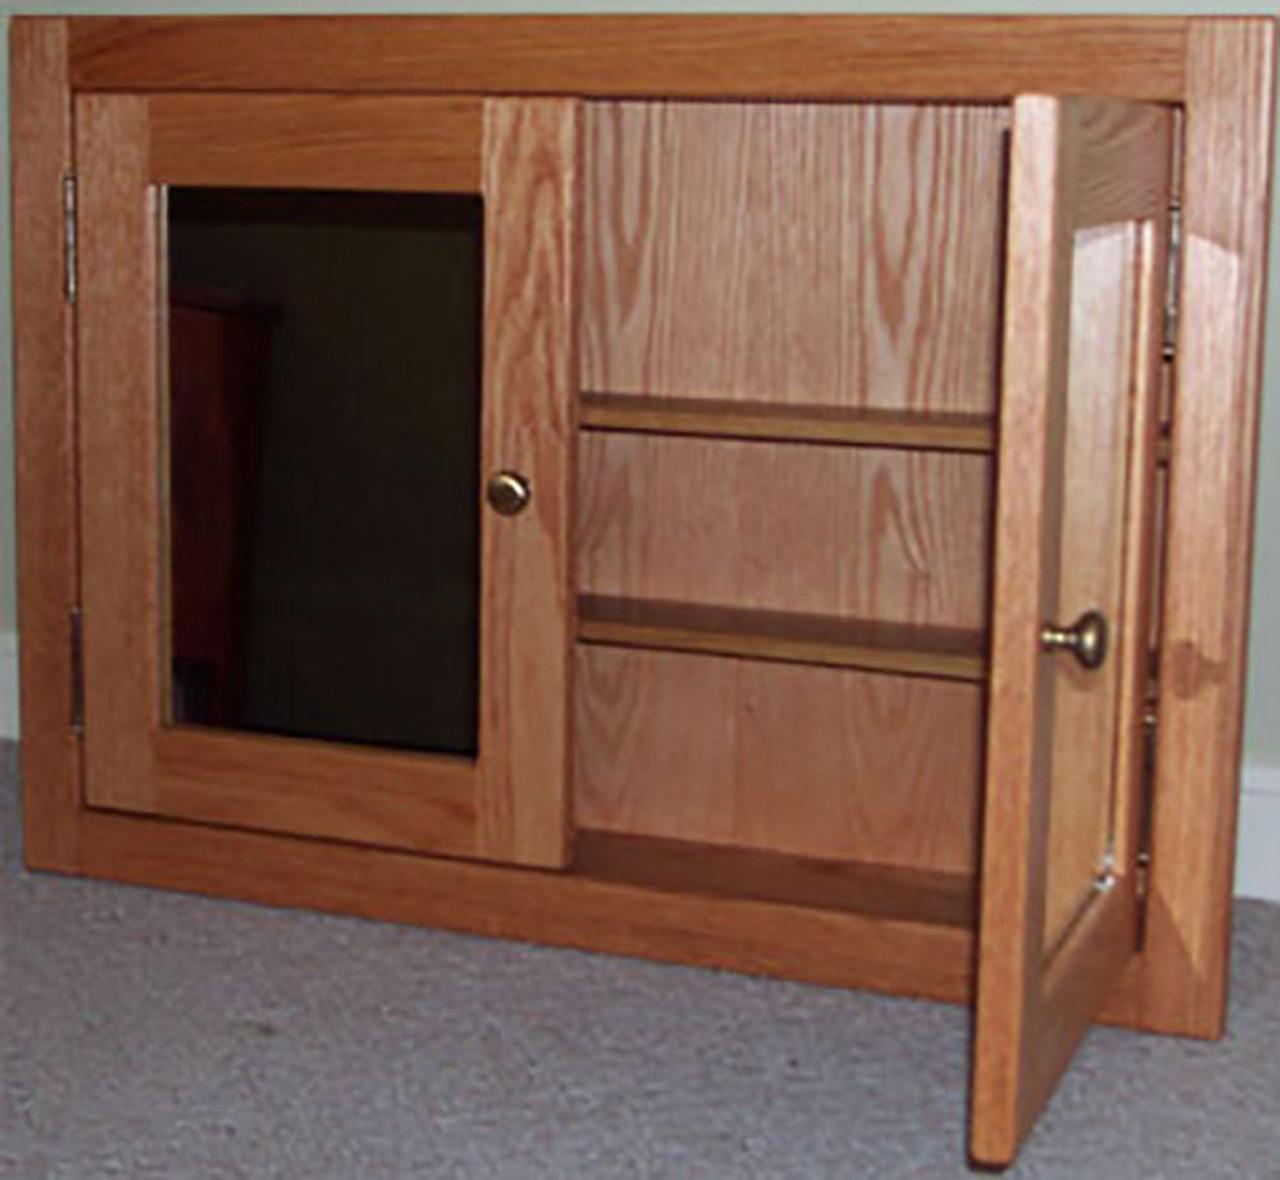 Prime Double Door Shaker Style Recessed Medicine Cabinet Painted Poplar Home Interior And Landscaping Mentranervesignezvosmurscom